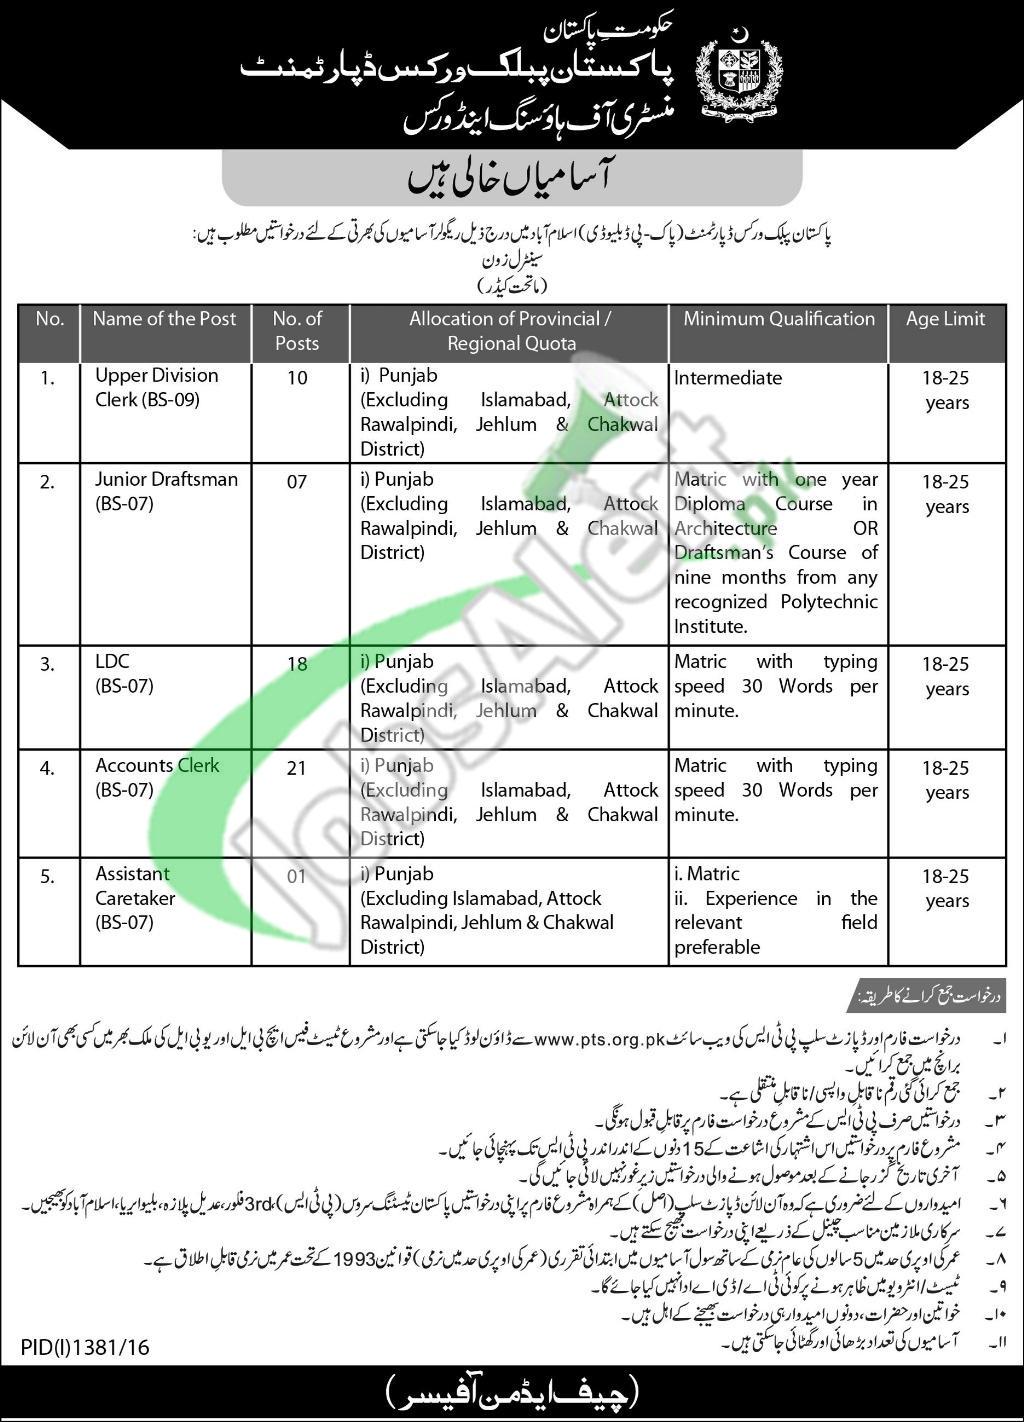 Pakistan Public Works Department Jobs